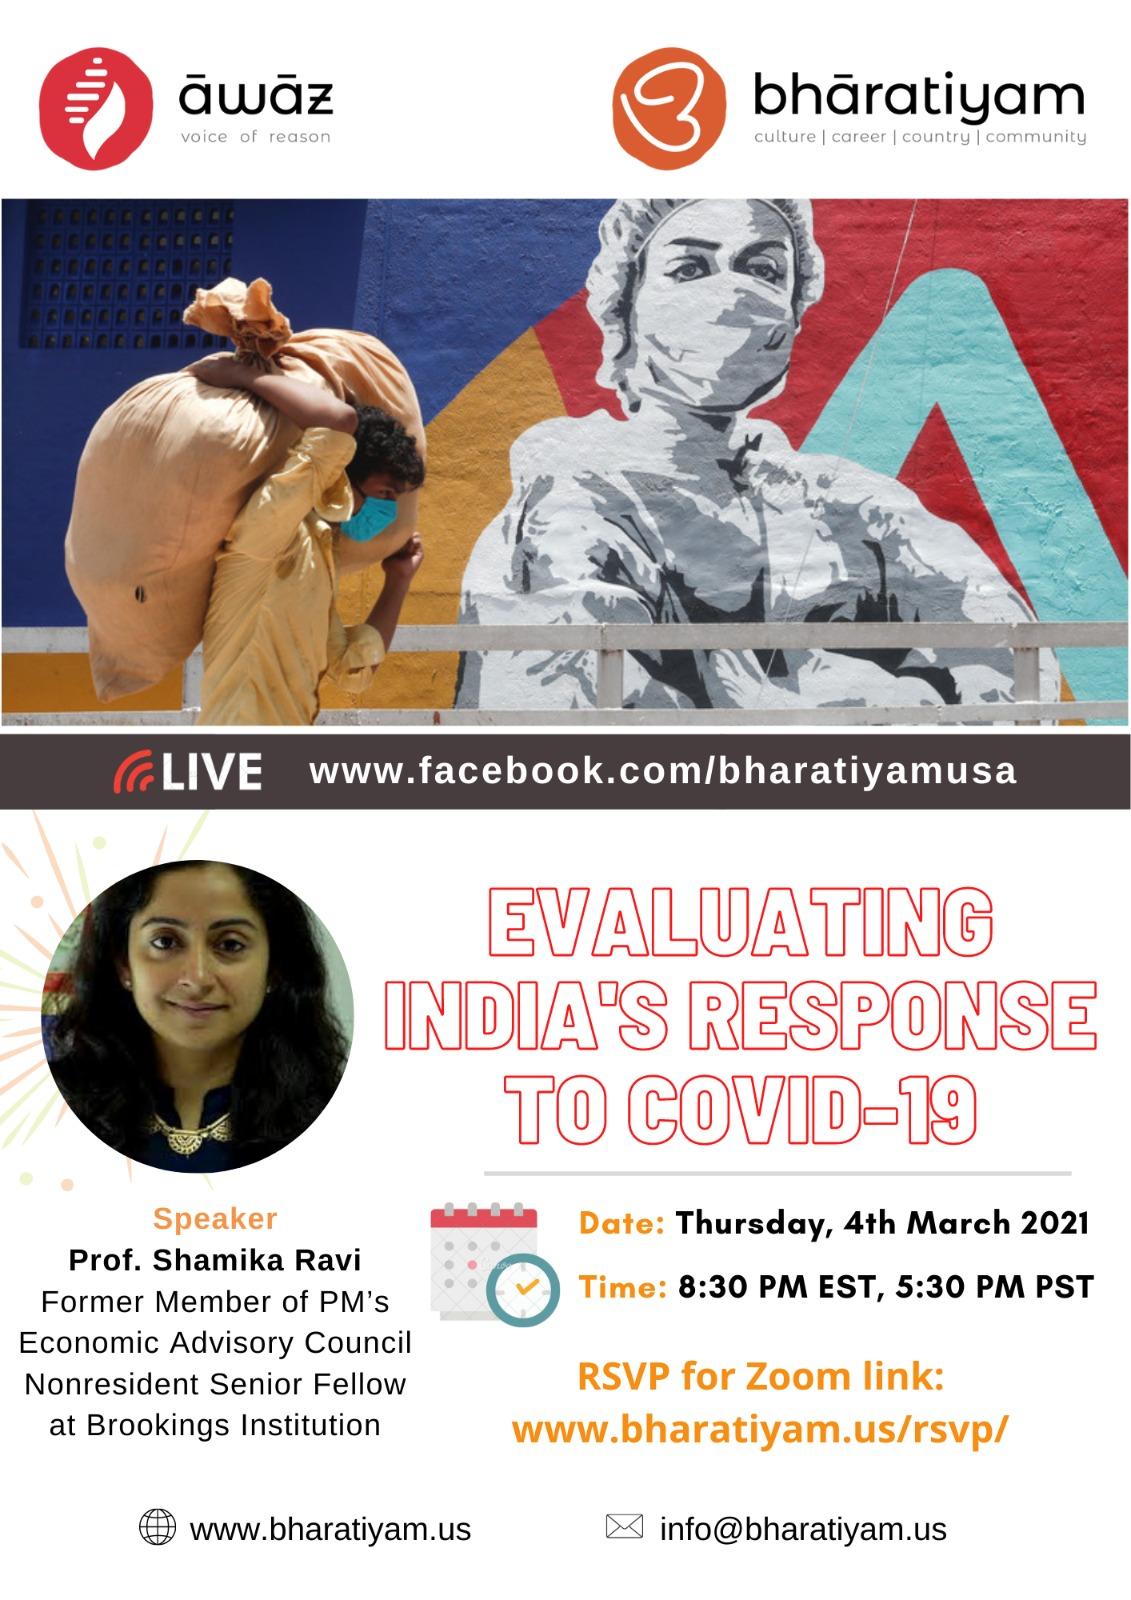 Evaluating India's Response to Covid-19 - Prof. Shamika Ravi